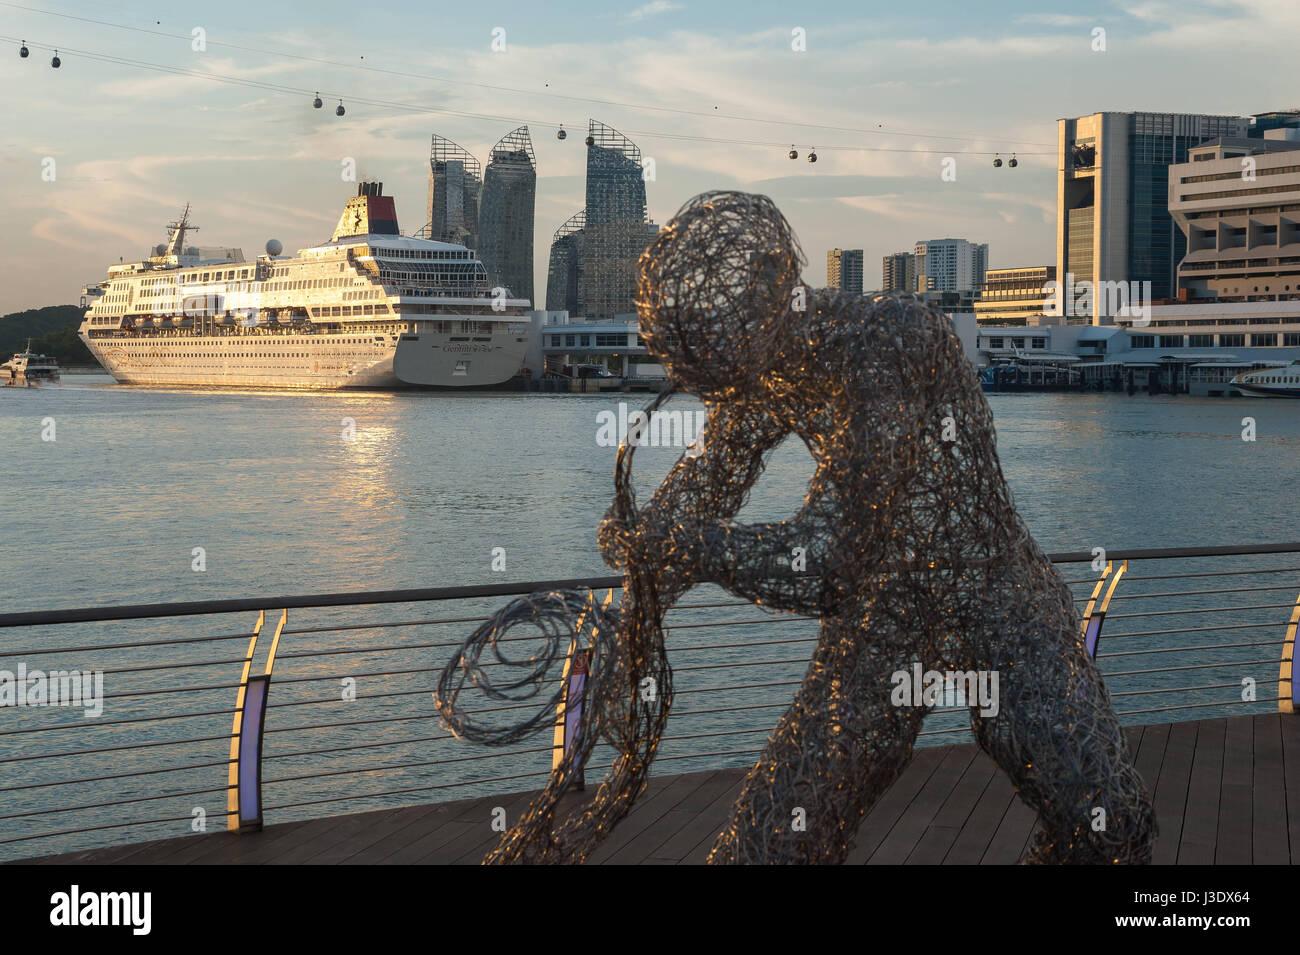 Singapur, Republik Singapur, Asien, Sentosa Boardwalk Stockbild